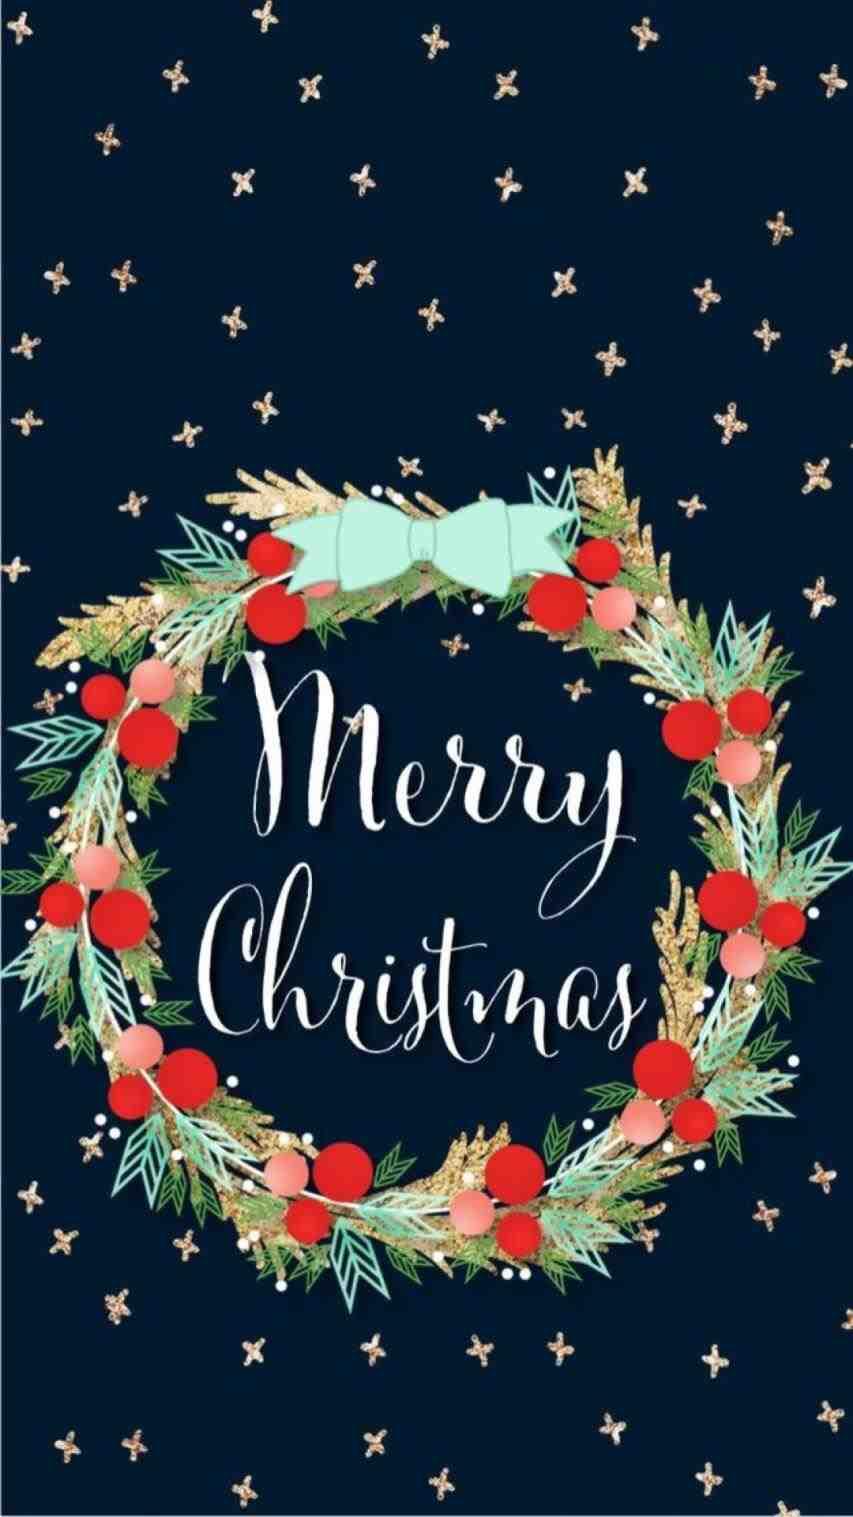 Cute Christmas Wallpapers - Top Free Cute Christmas ...